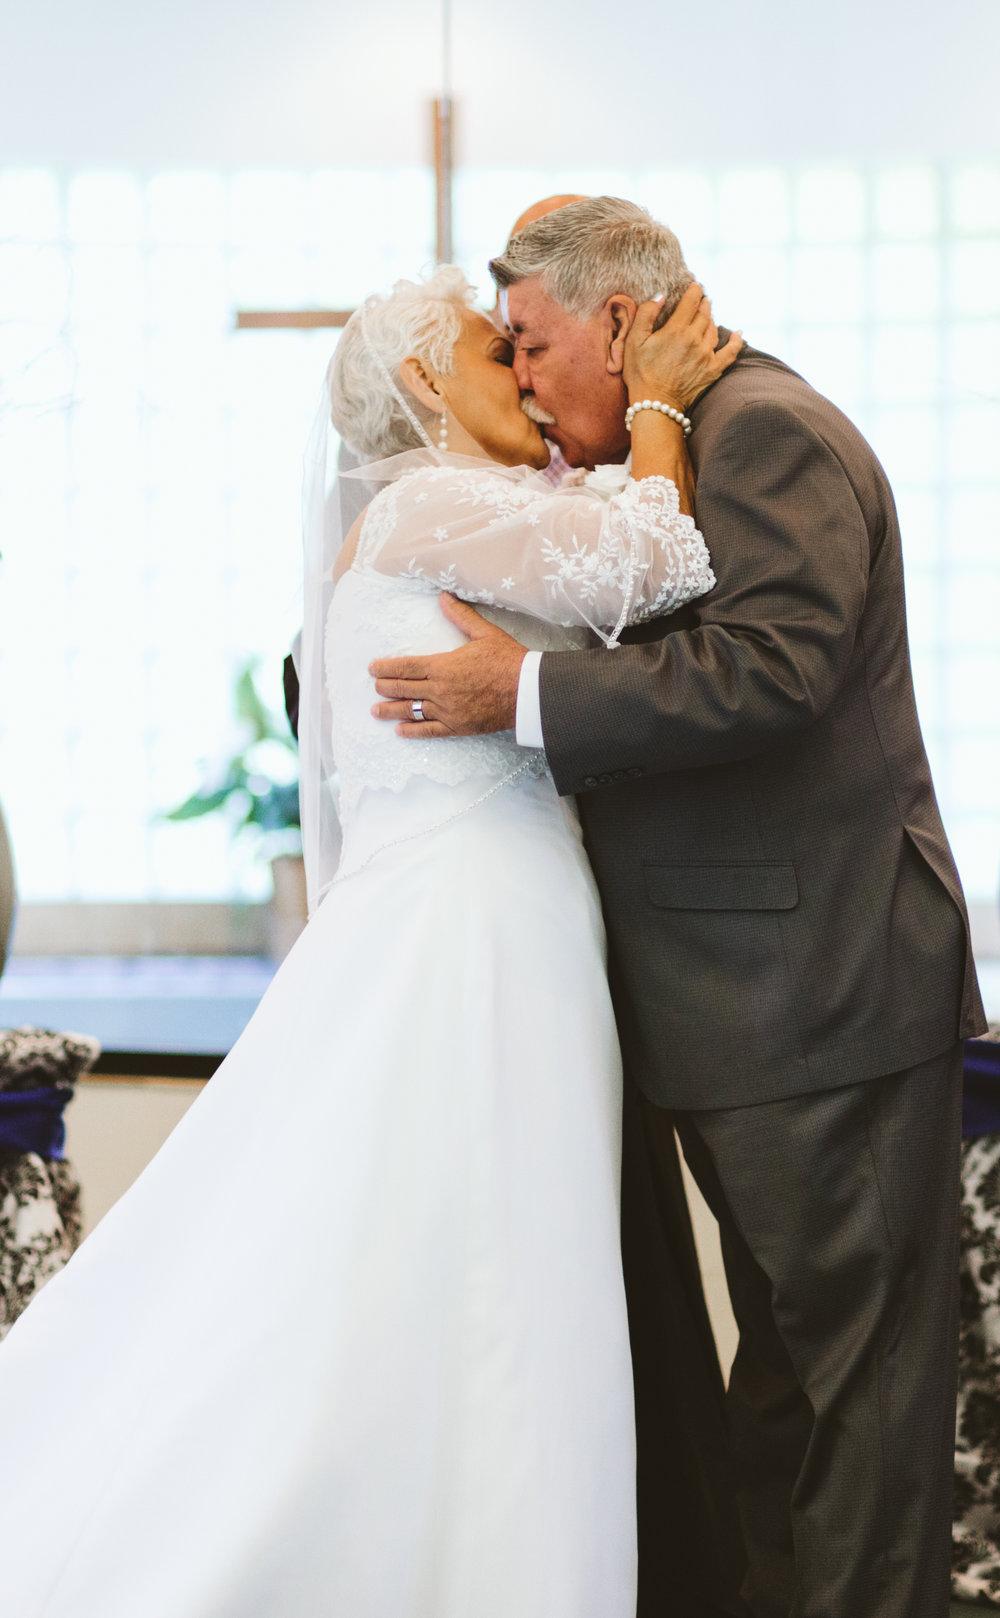 wedding | Vanessa Boy Photography | vanessaboy.com |-156.jpg